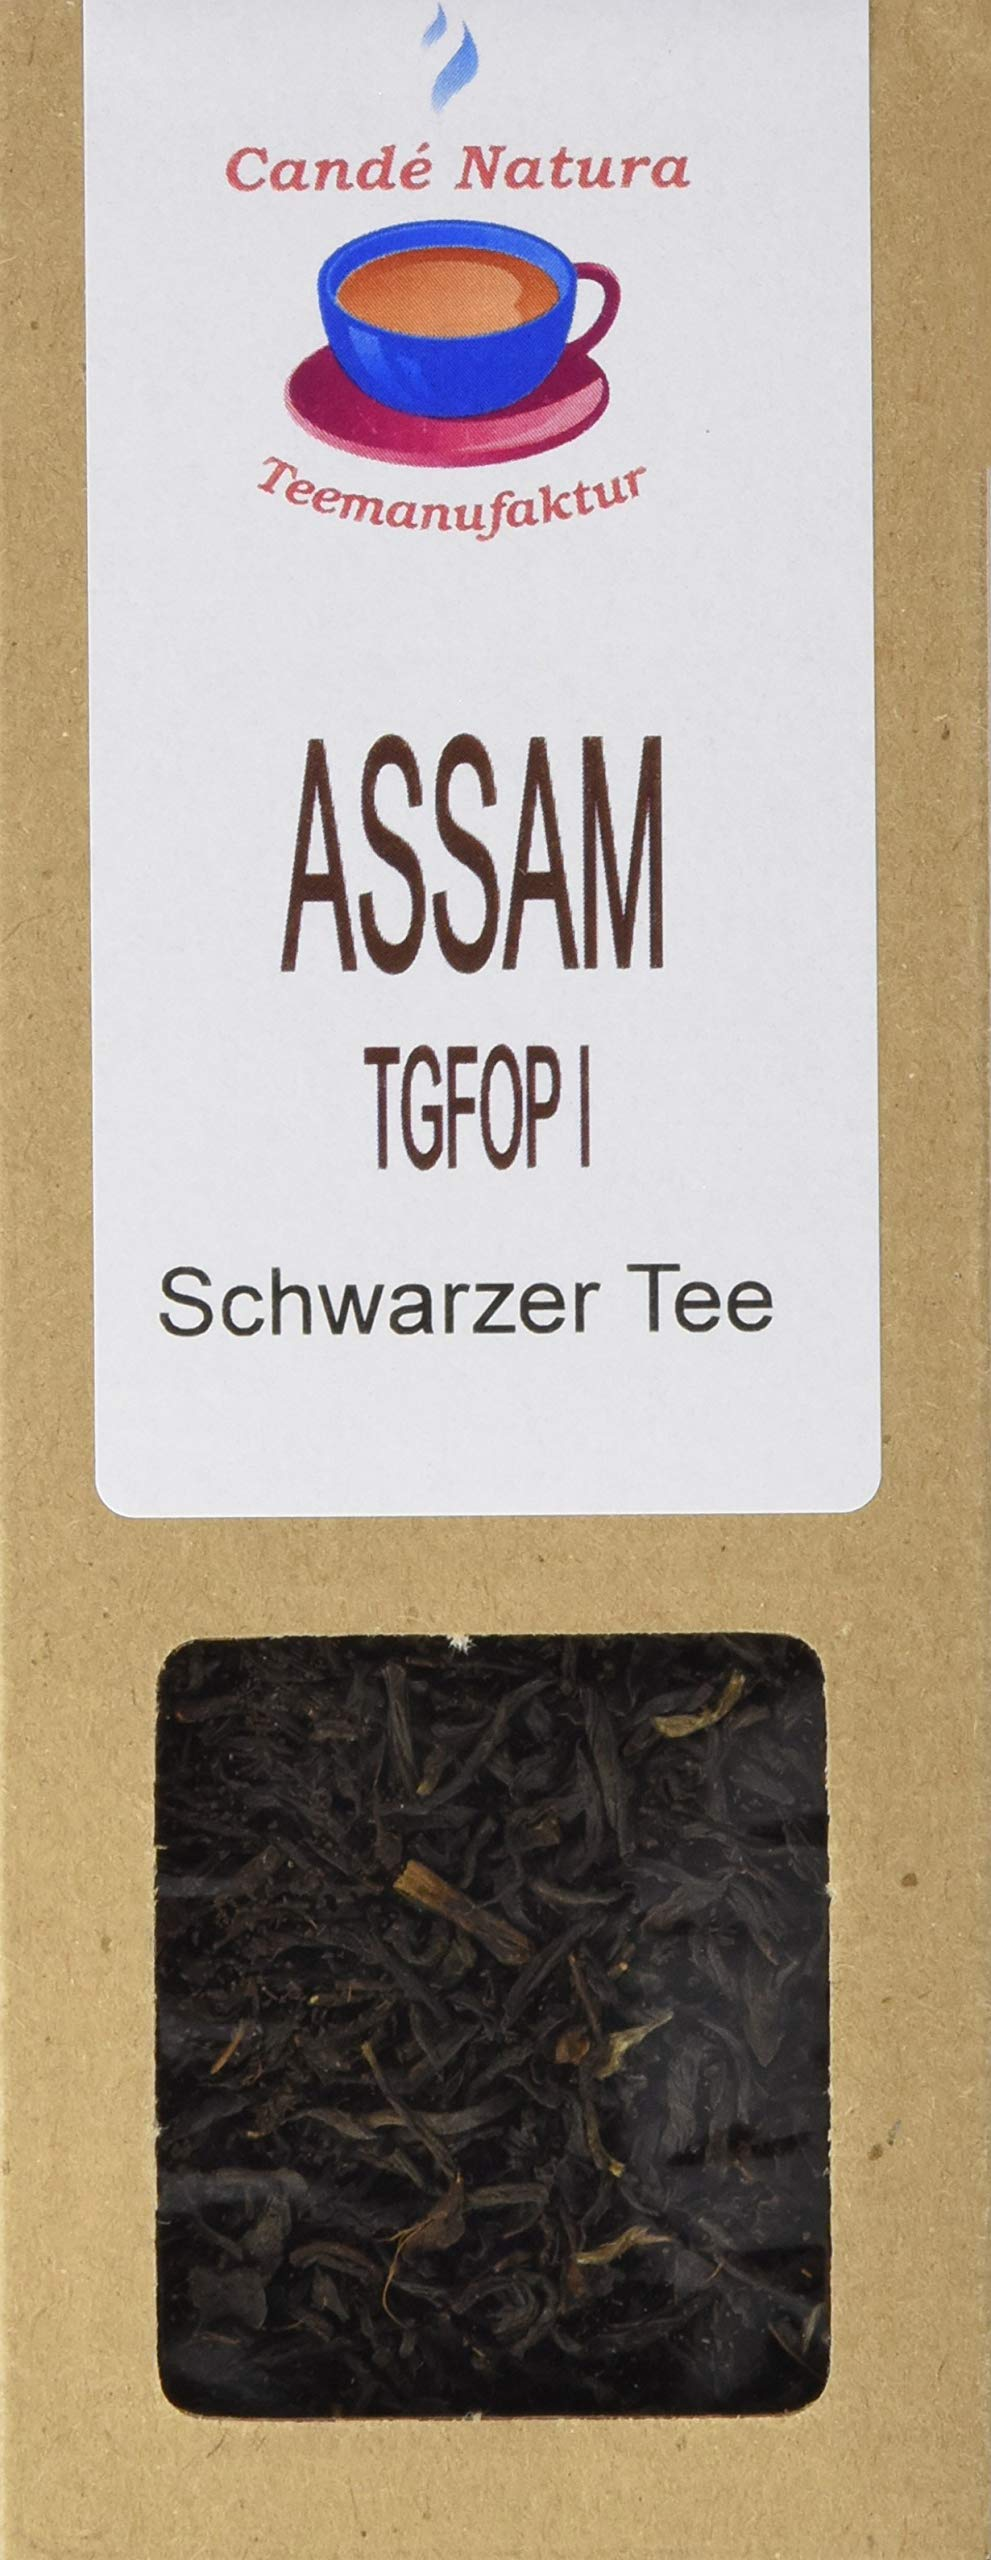 Cand-Natura-Teemanufaktur-Assam-schwarzer-Tee-Basistee-5er-Pack-5-x-85-g